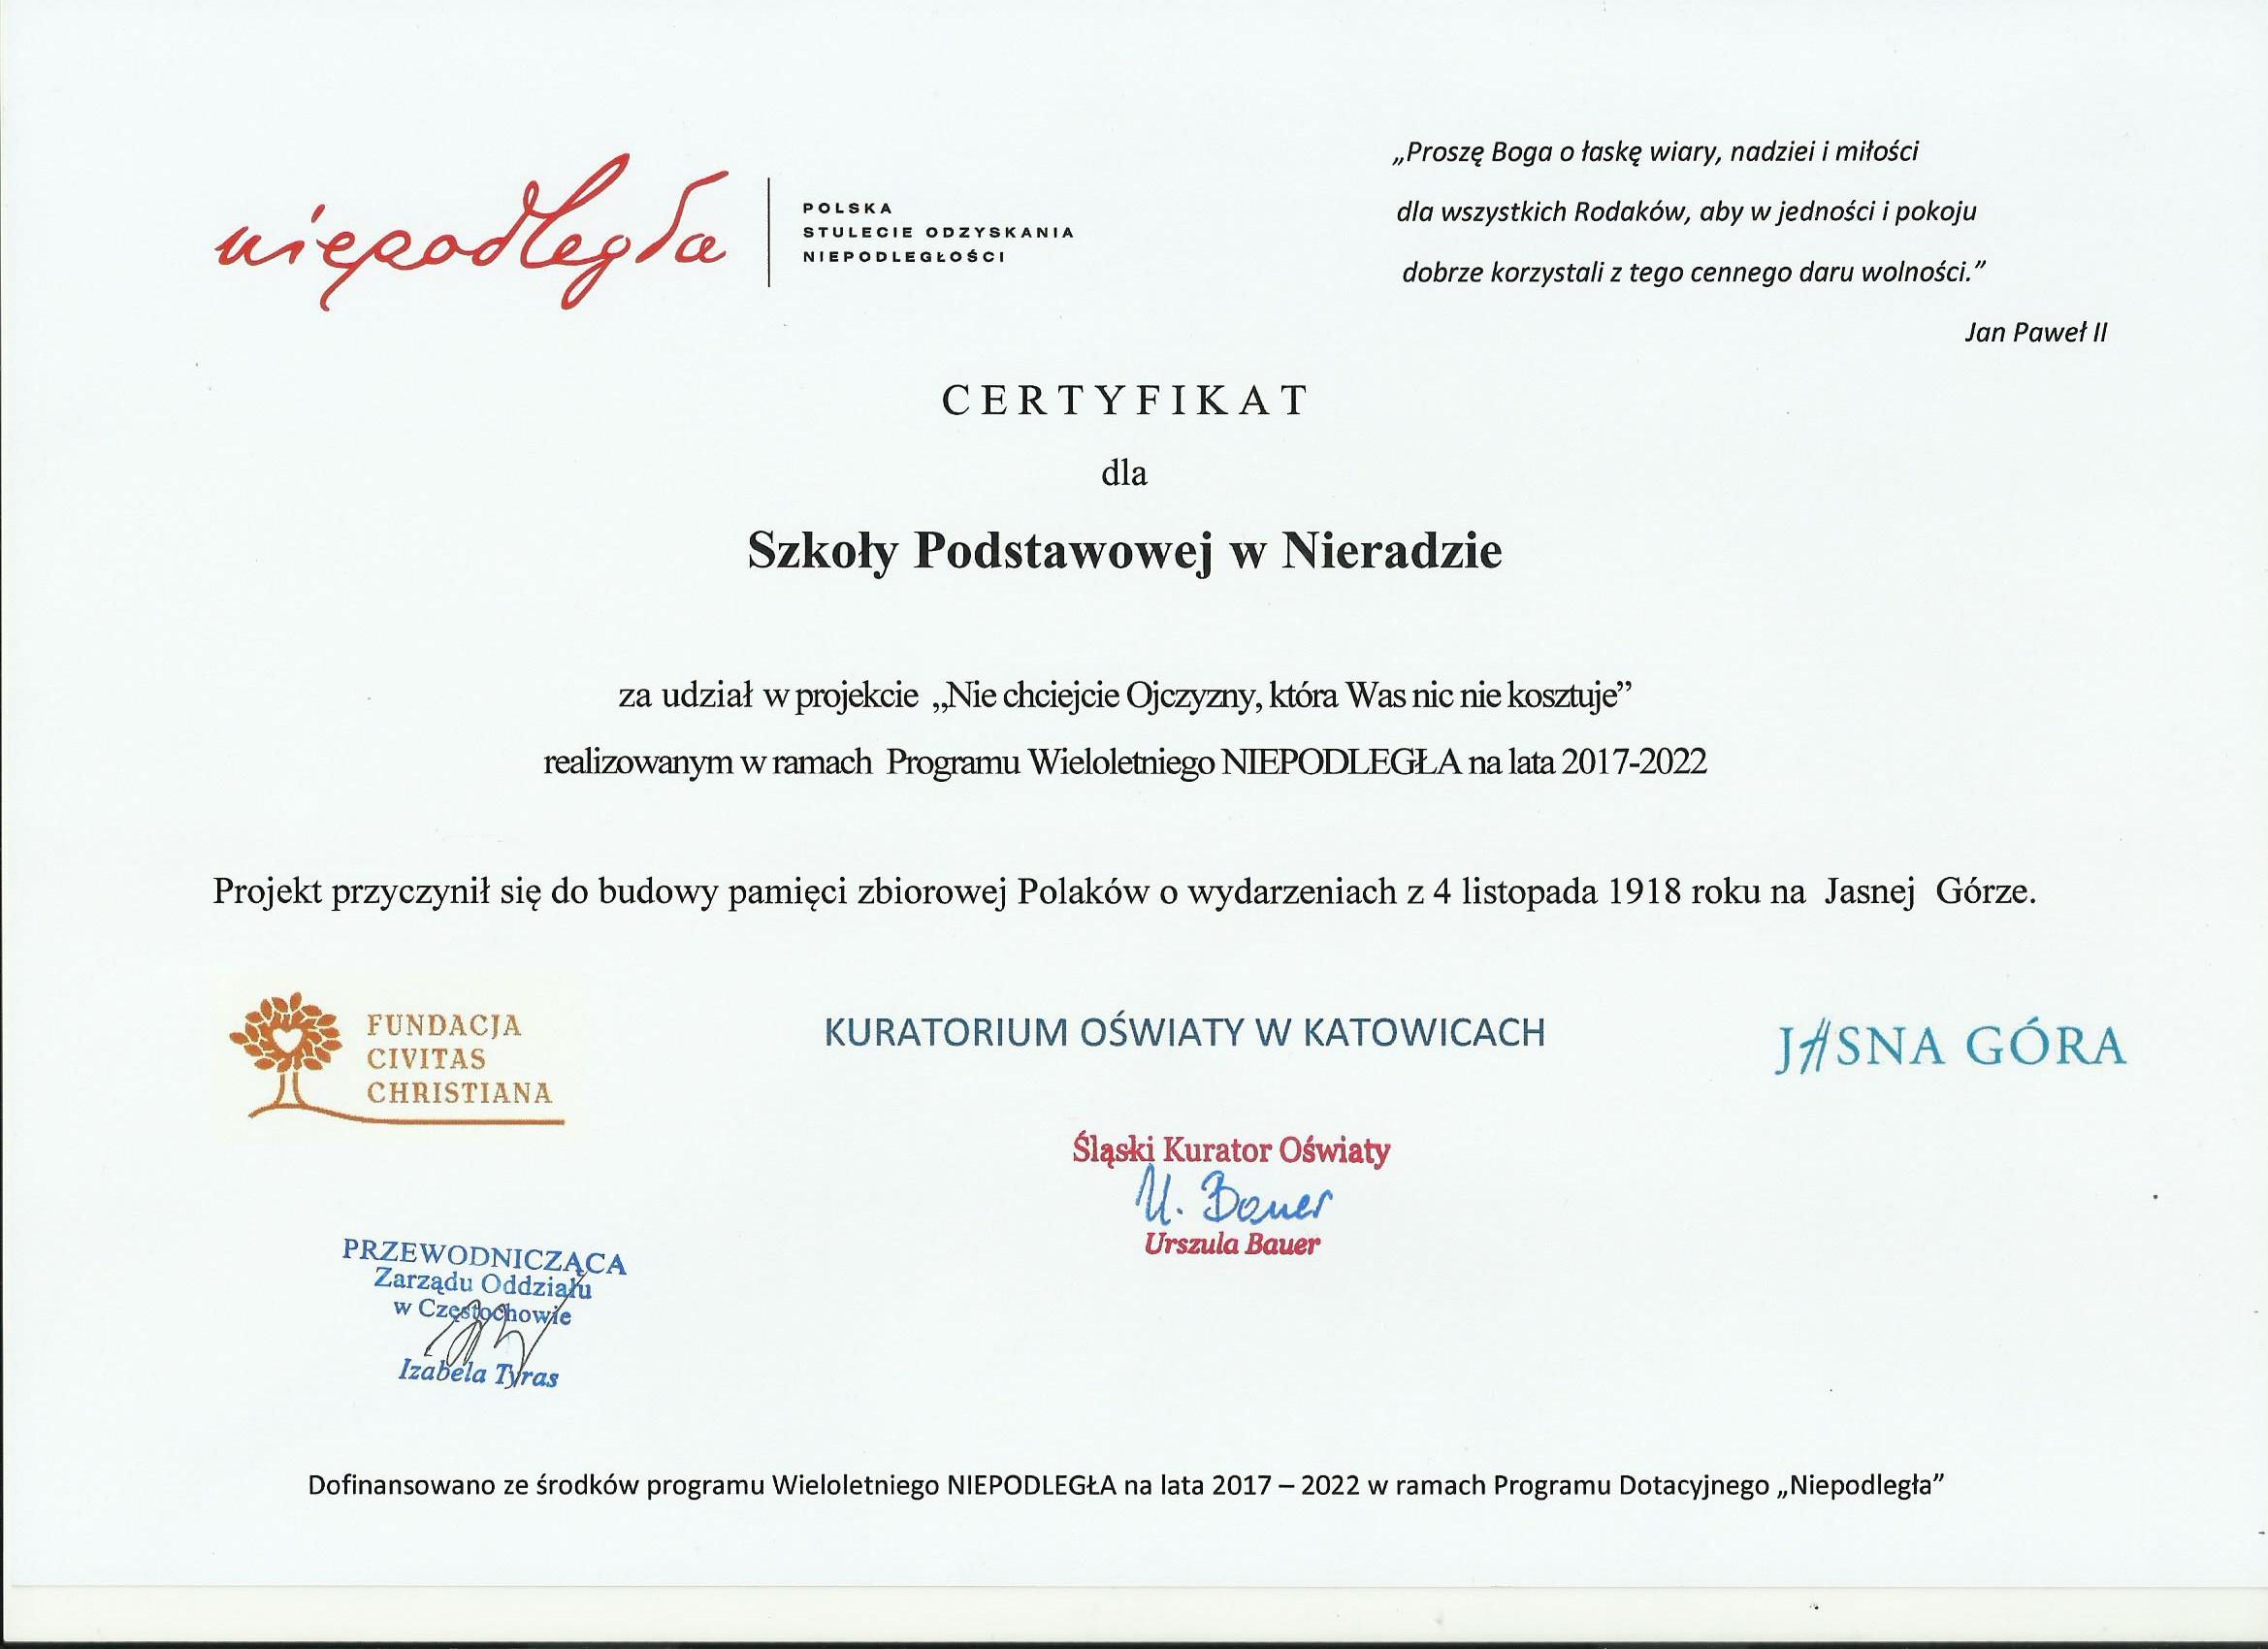 http://spnierada.szkolnastrona.pl/container/niepodlegla.jpg